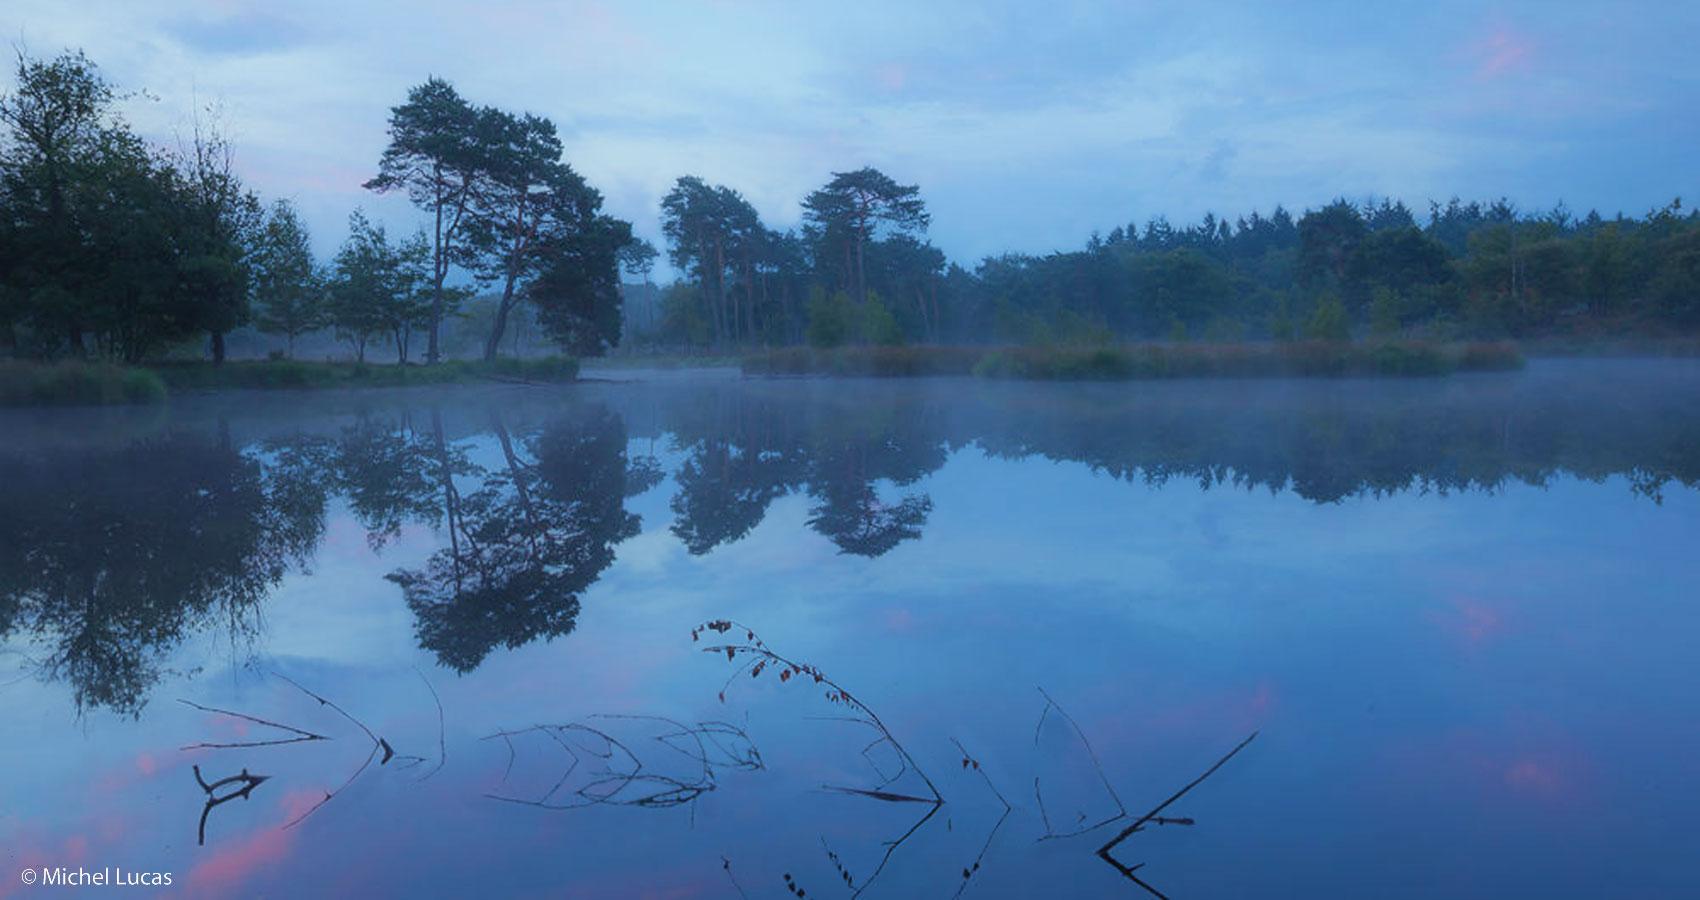 Het stille water eert by Hanno Cramer at Spillwords.com